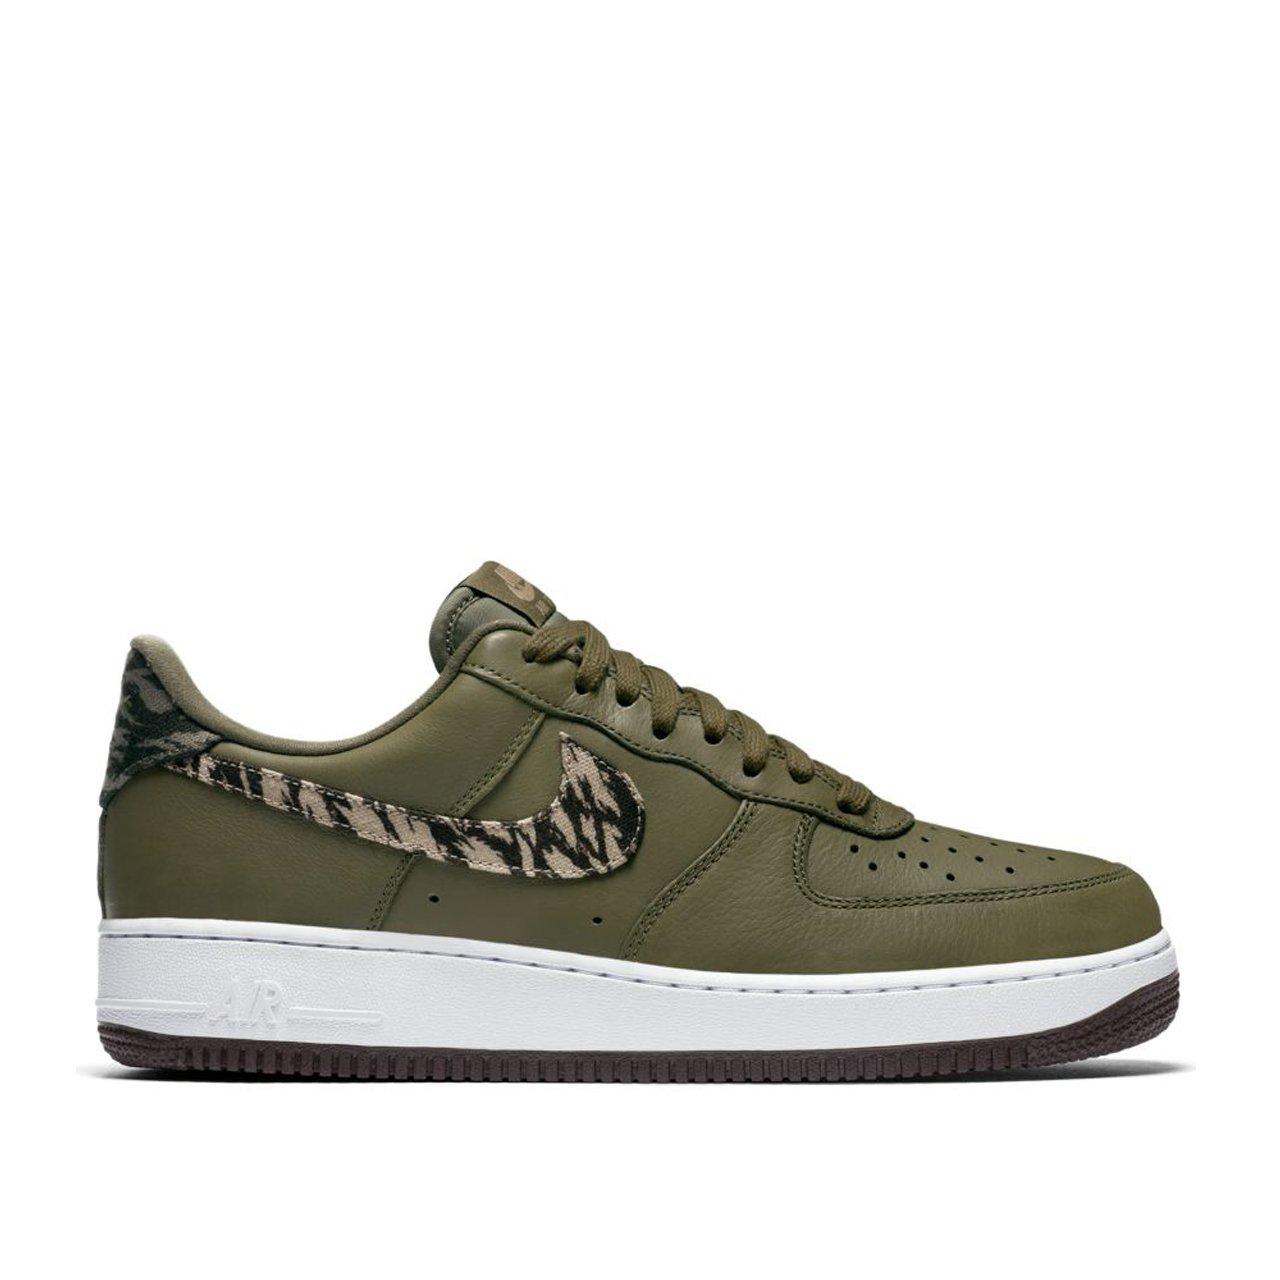 nike sportswear air force 1 '07 premium dames sneakers (groen)